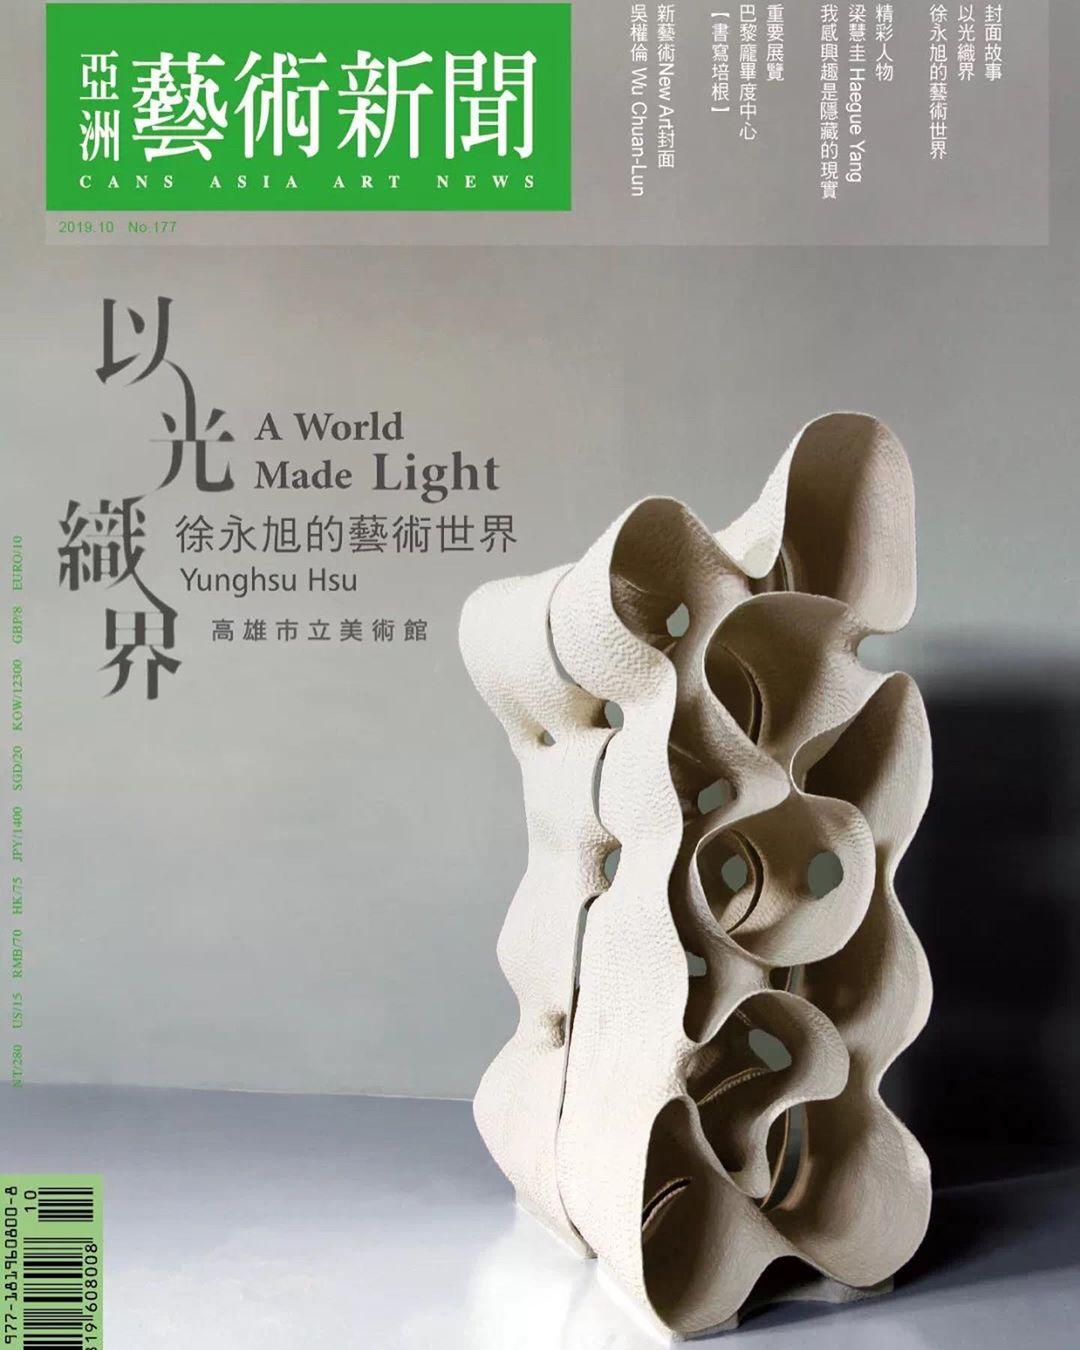 亞洲藝術新聞 CANS Oct issue 2019.jpg